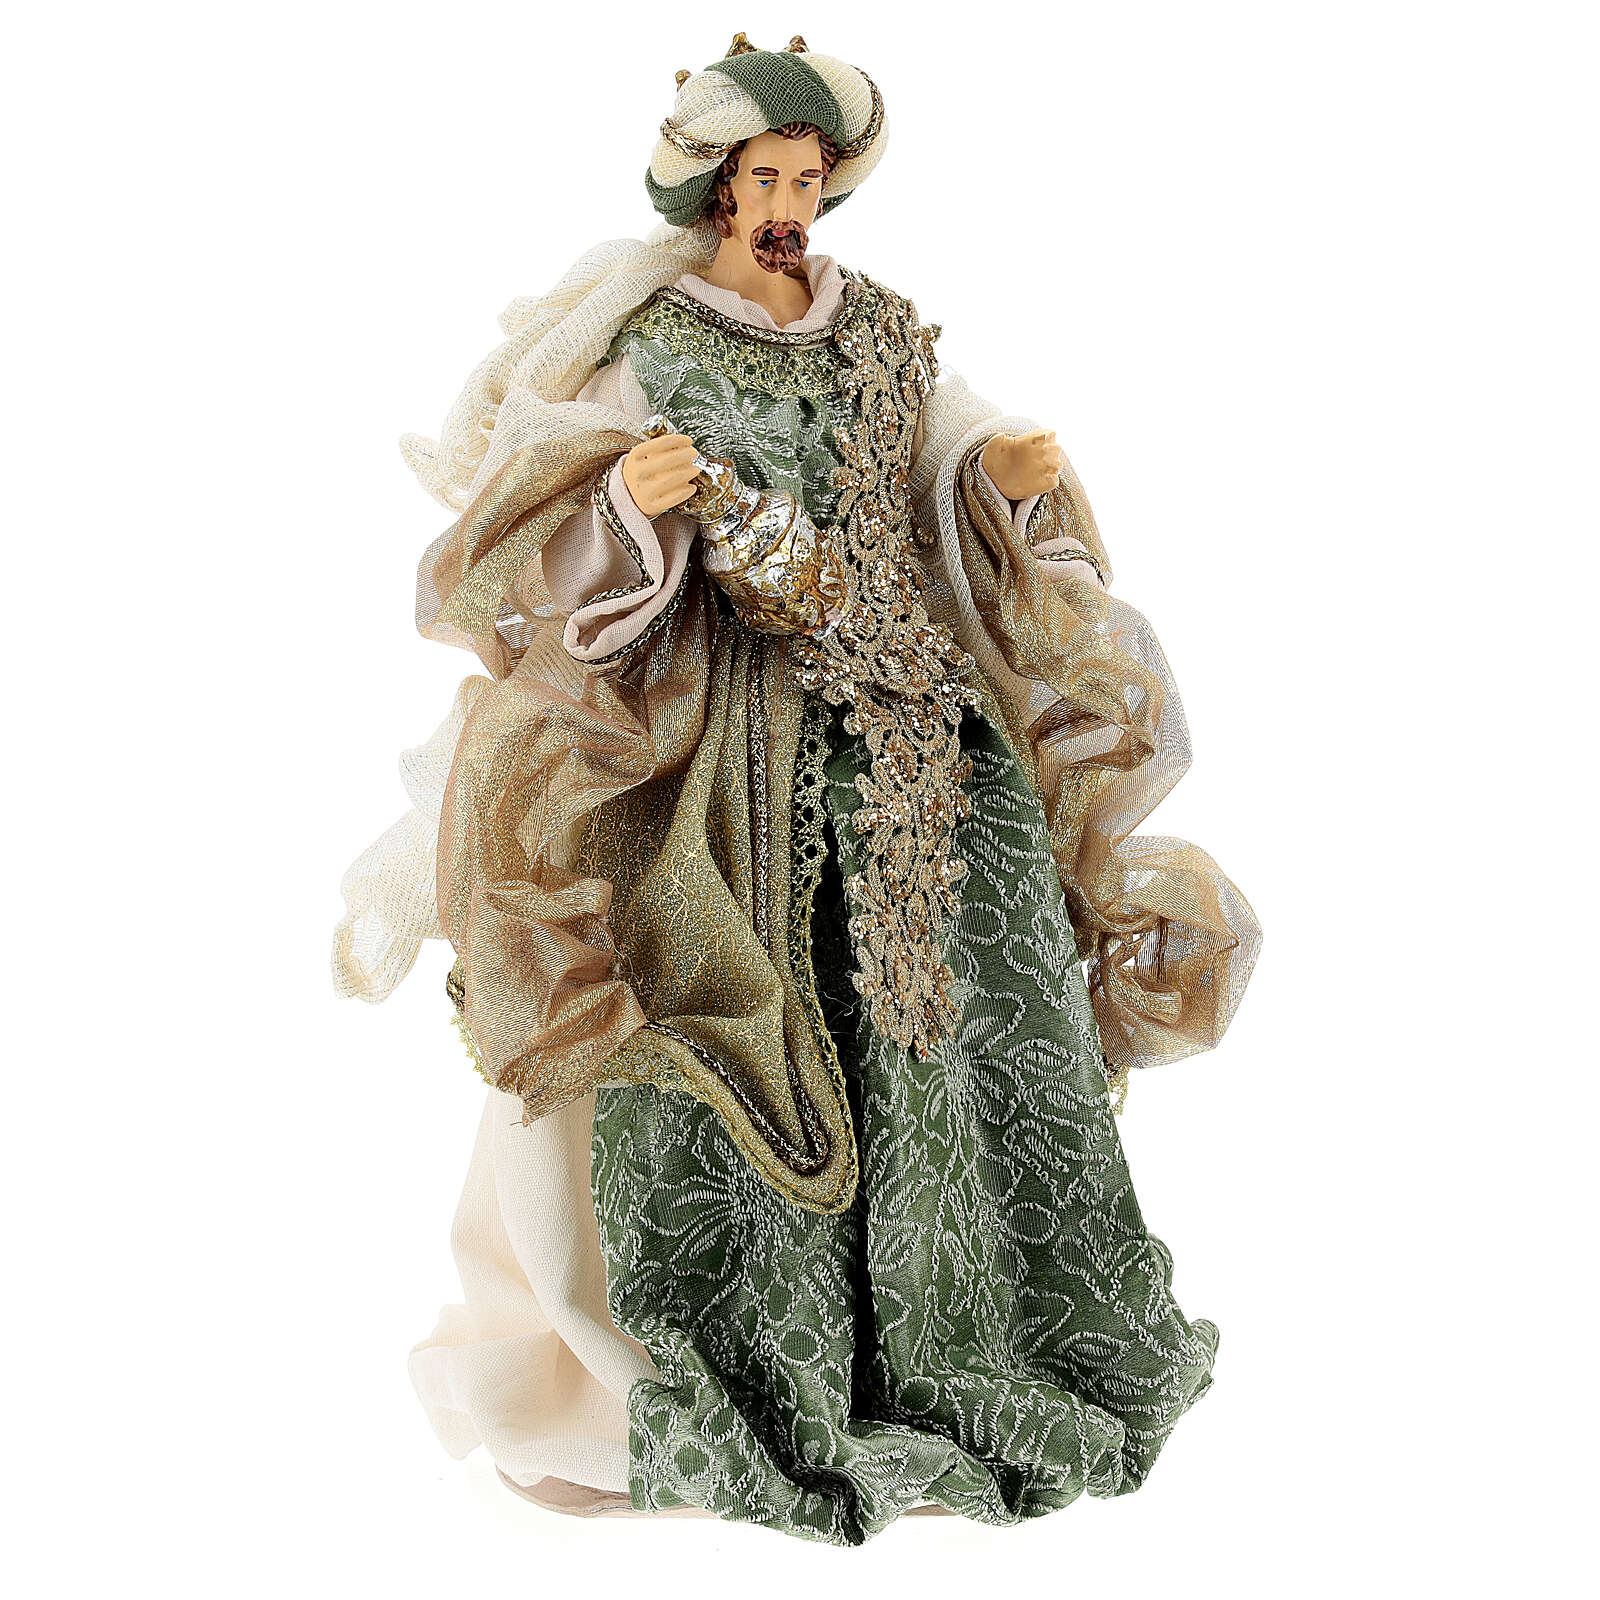 Natività 6 pezzi stile veneziano resina e stoffa verde oro 40 cm  4